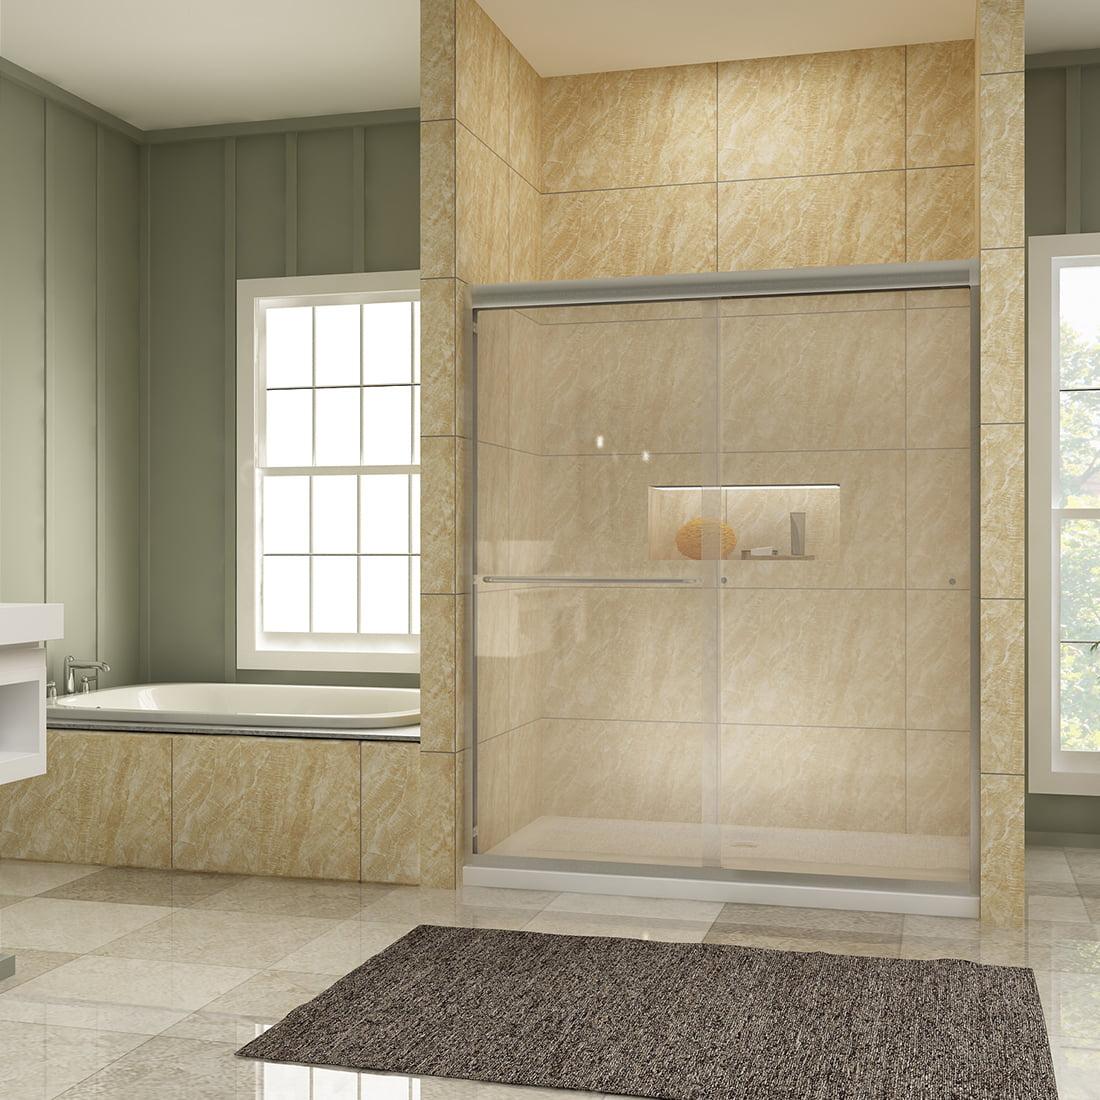 Sunny Shower 60 X 72 Semi Frameless 2 Sliding Shower Doors 5 16 Clear Glass Brushed Nickel Finish B0322p